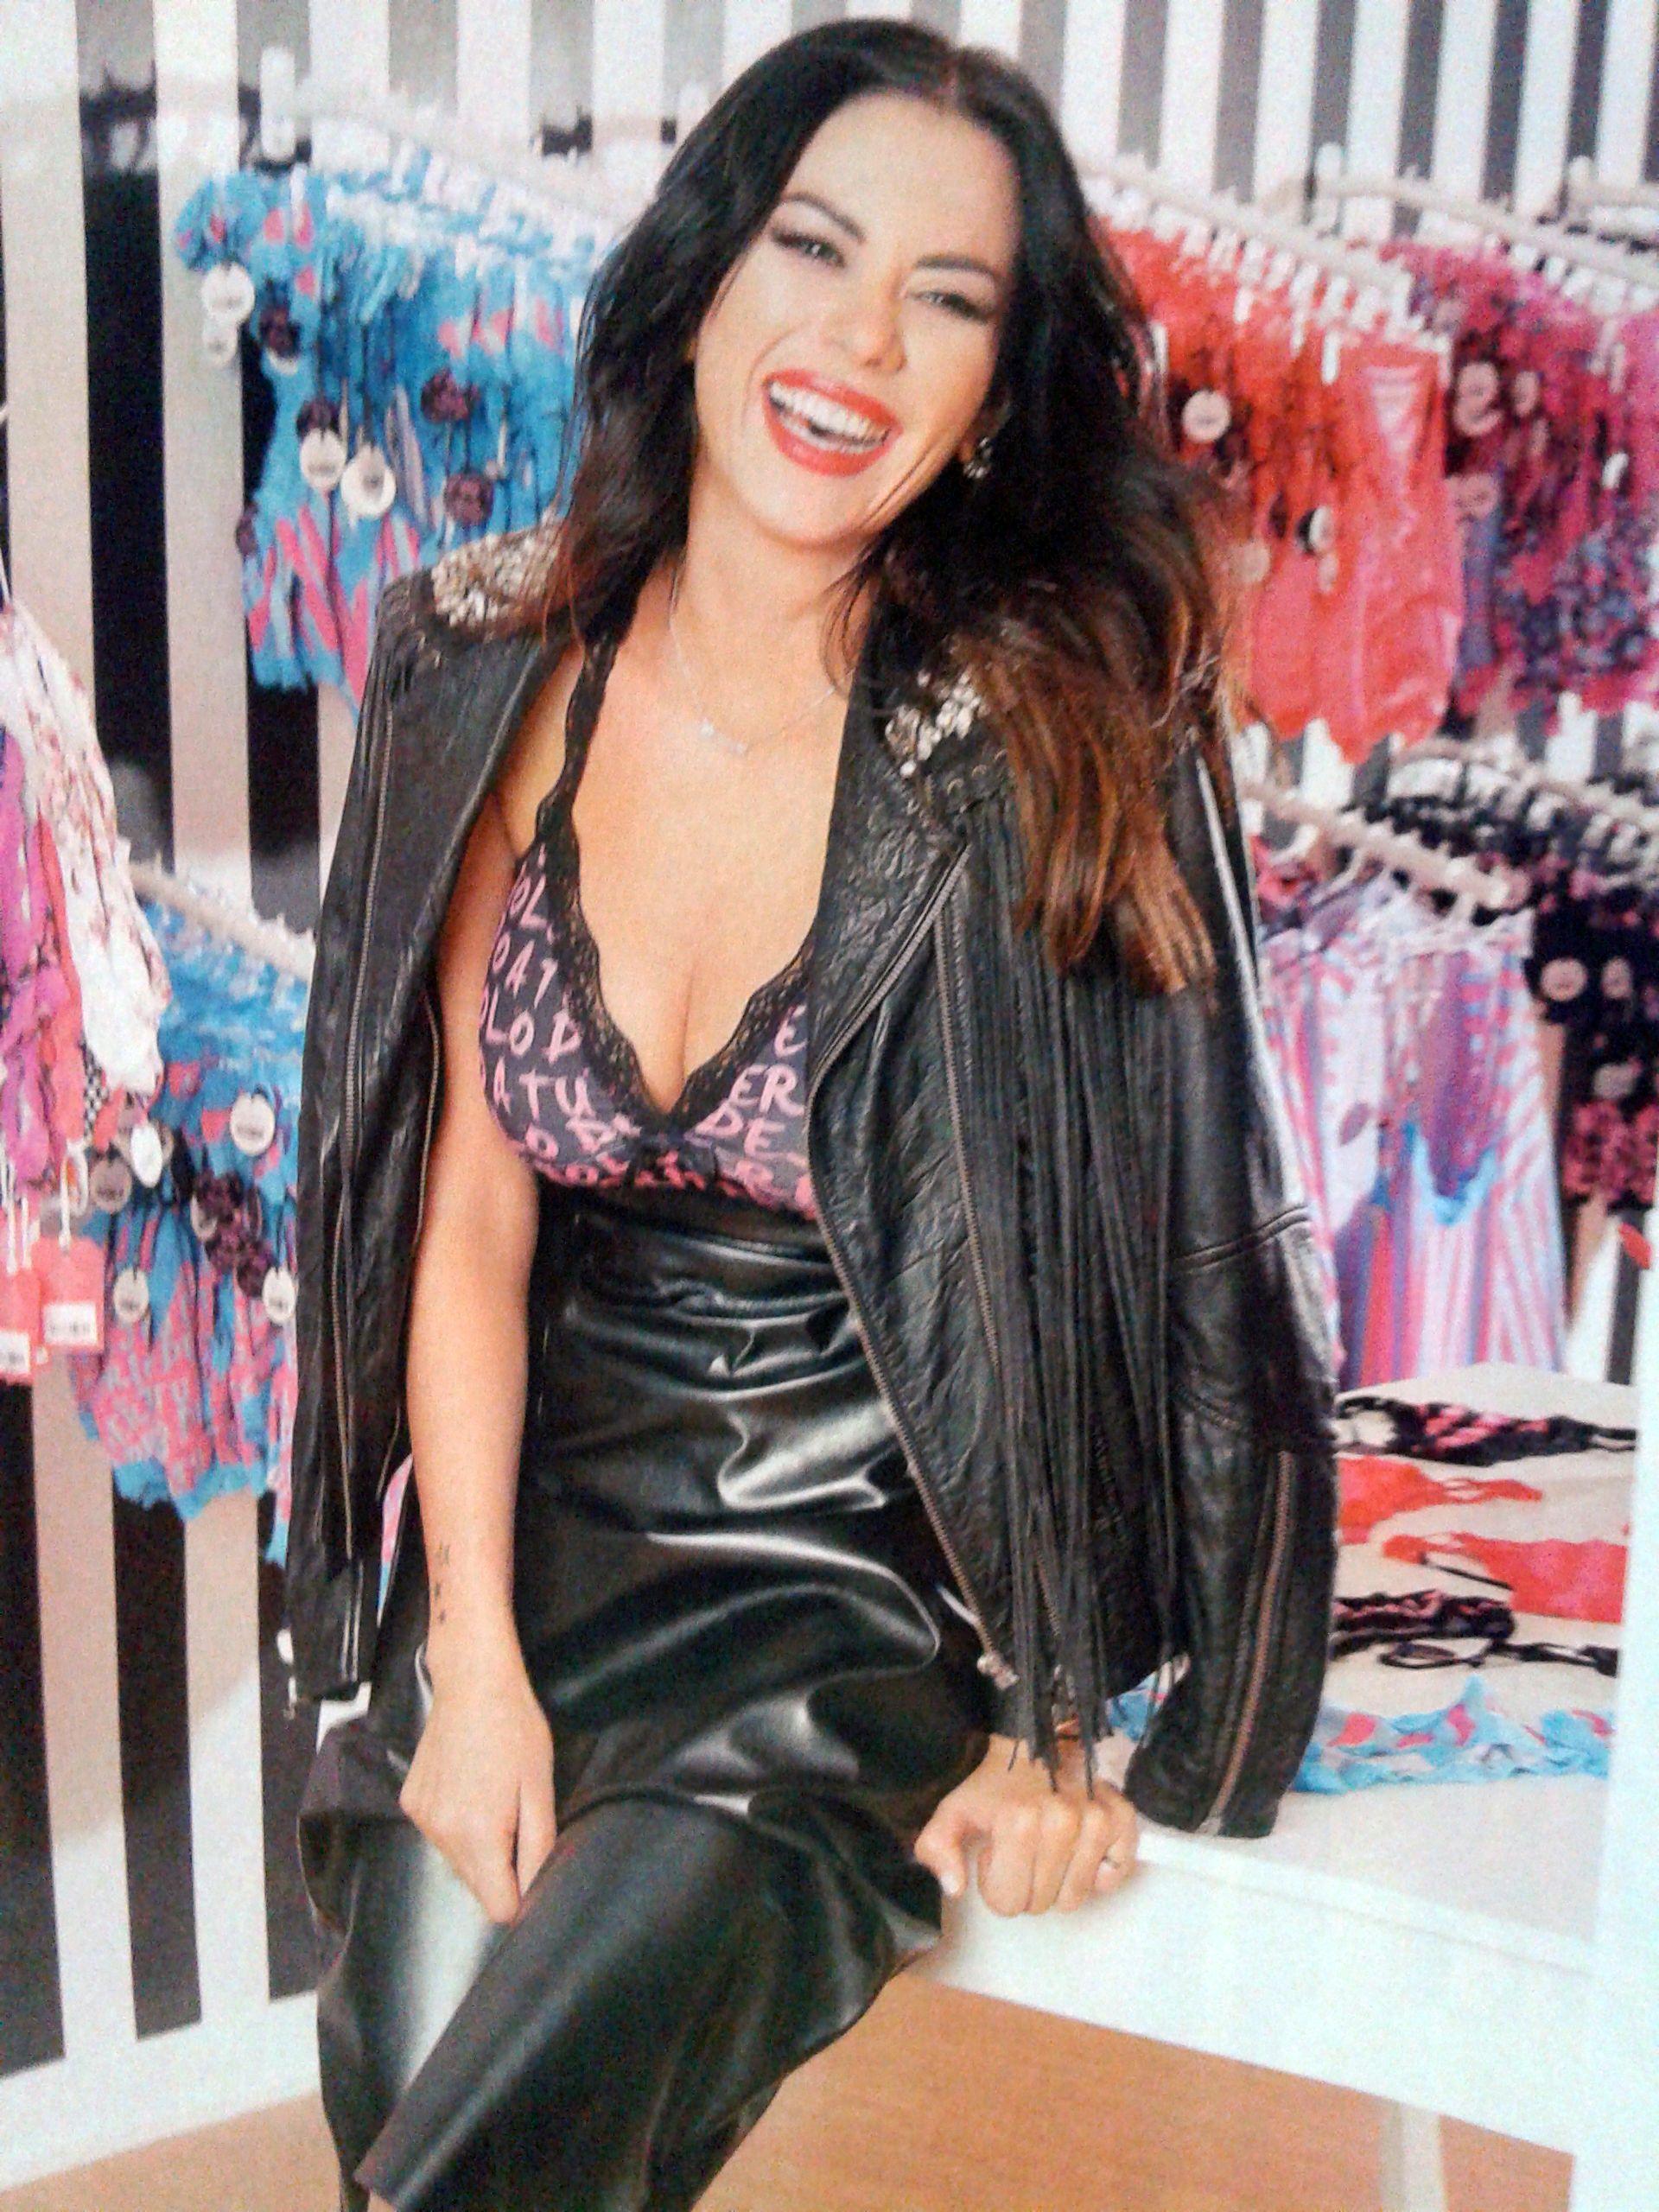 Con escotes muy provocativos, Karina Jelinek asegura: Voy a ser vendedora en mi propio local